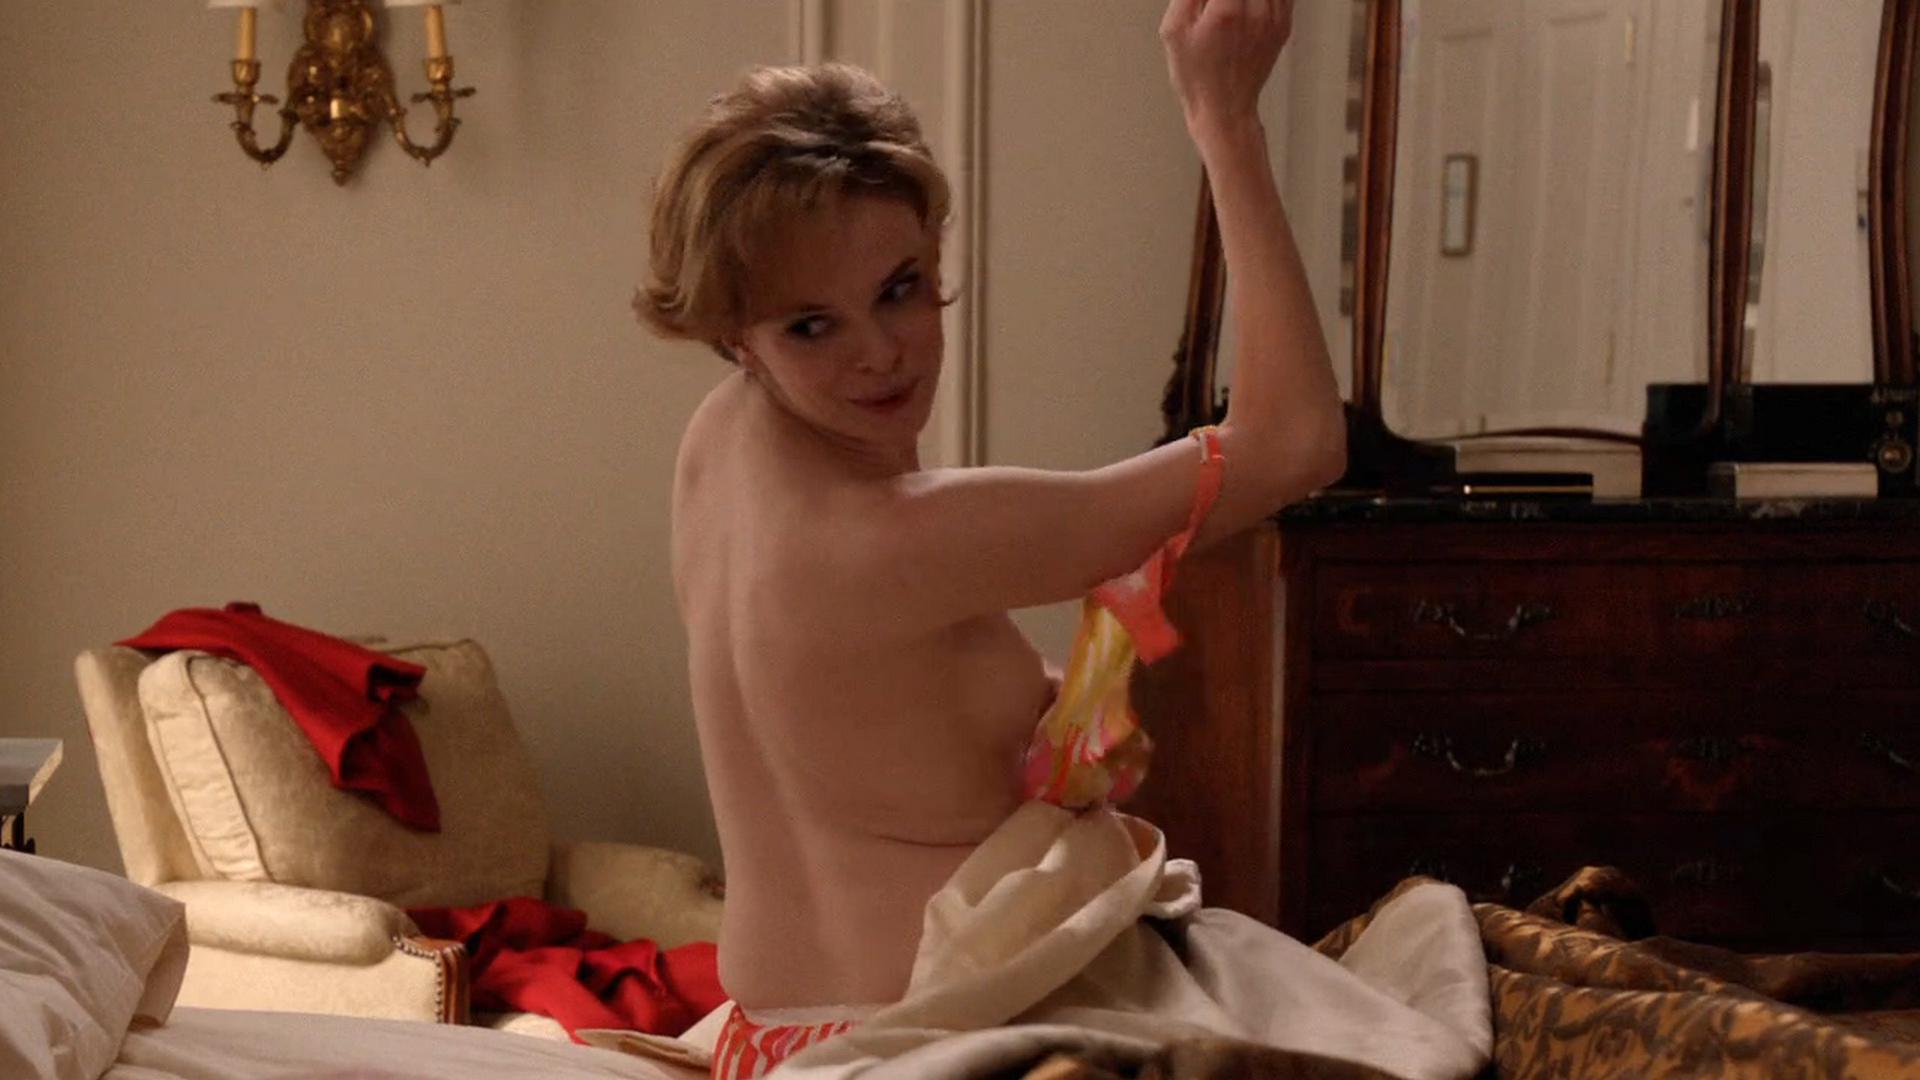 Danielle panabaker desnuda desnuda